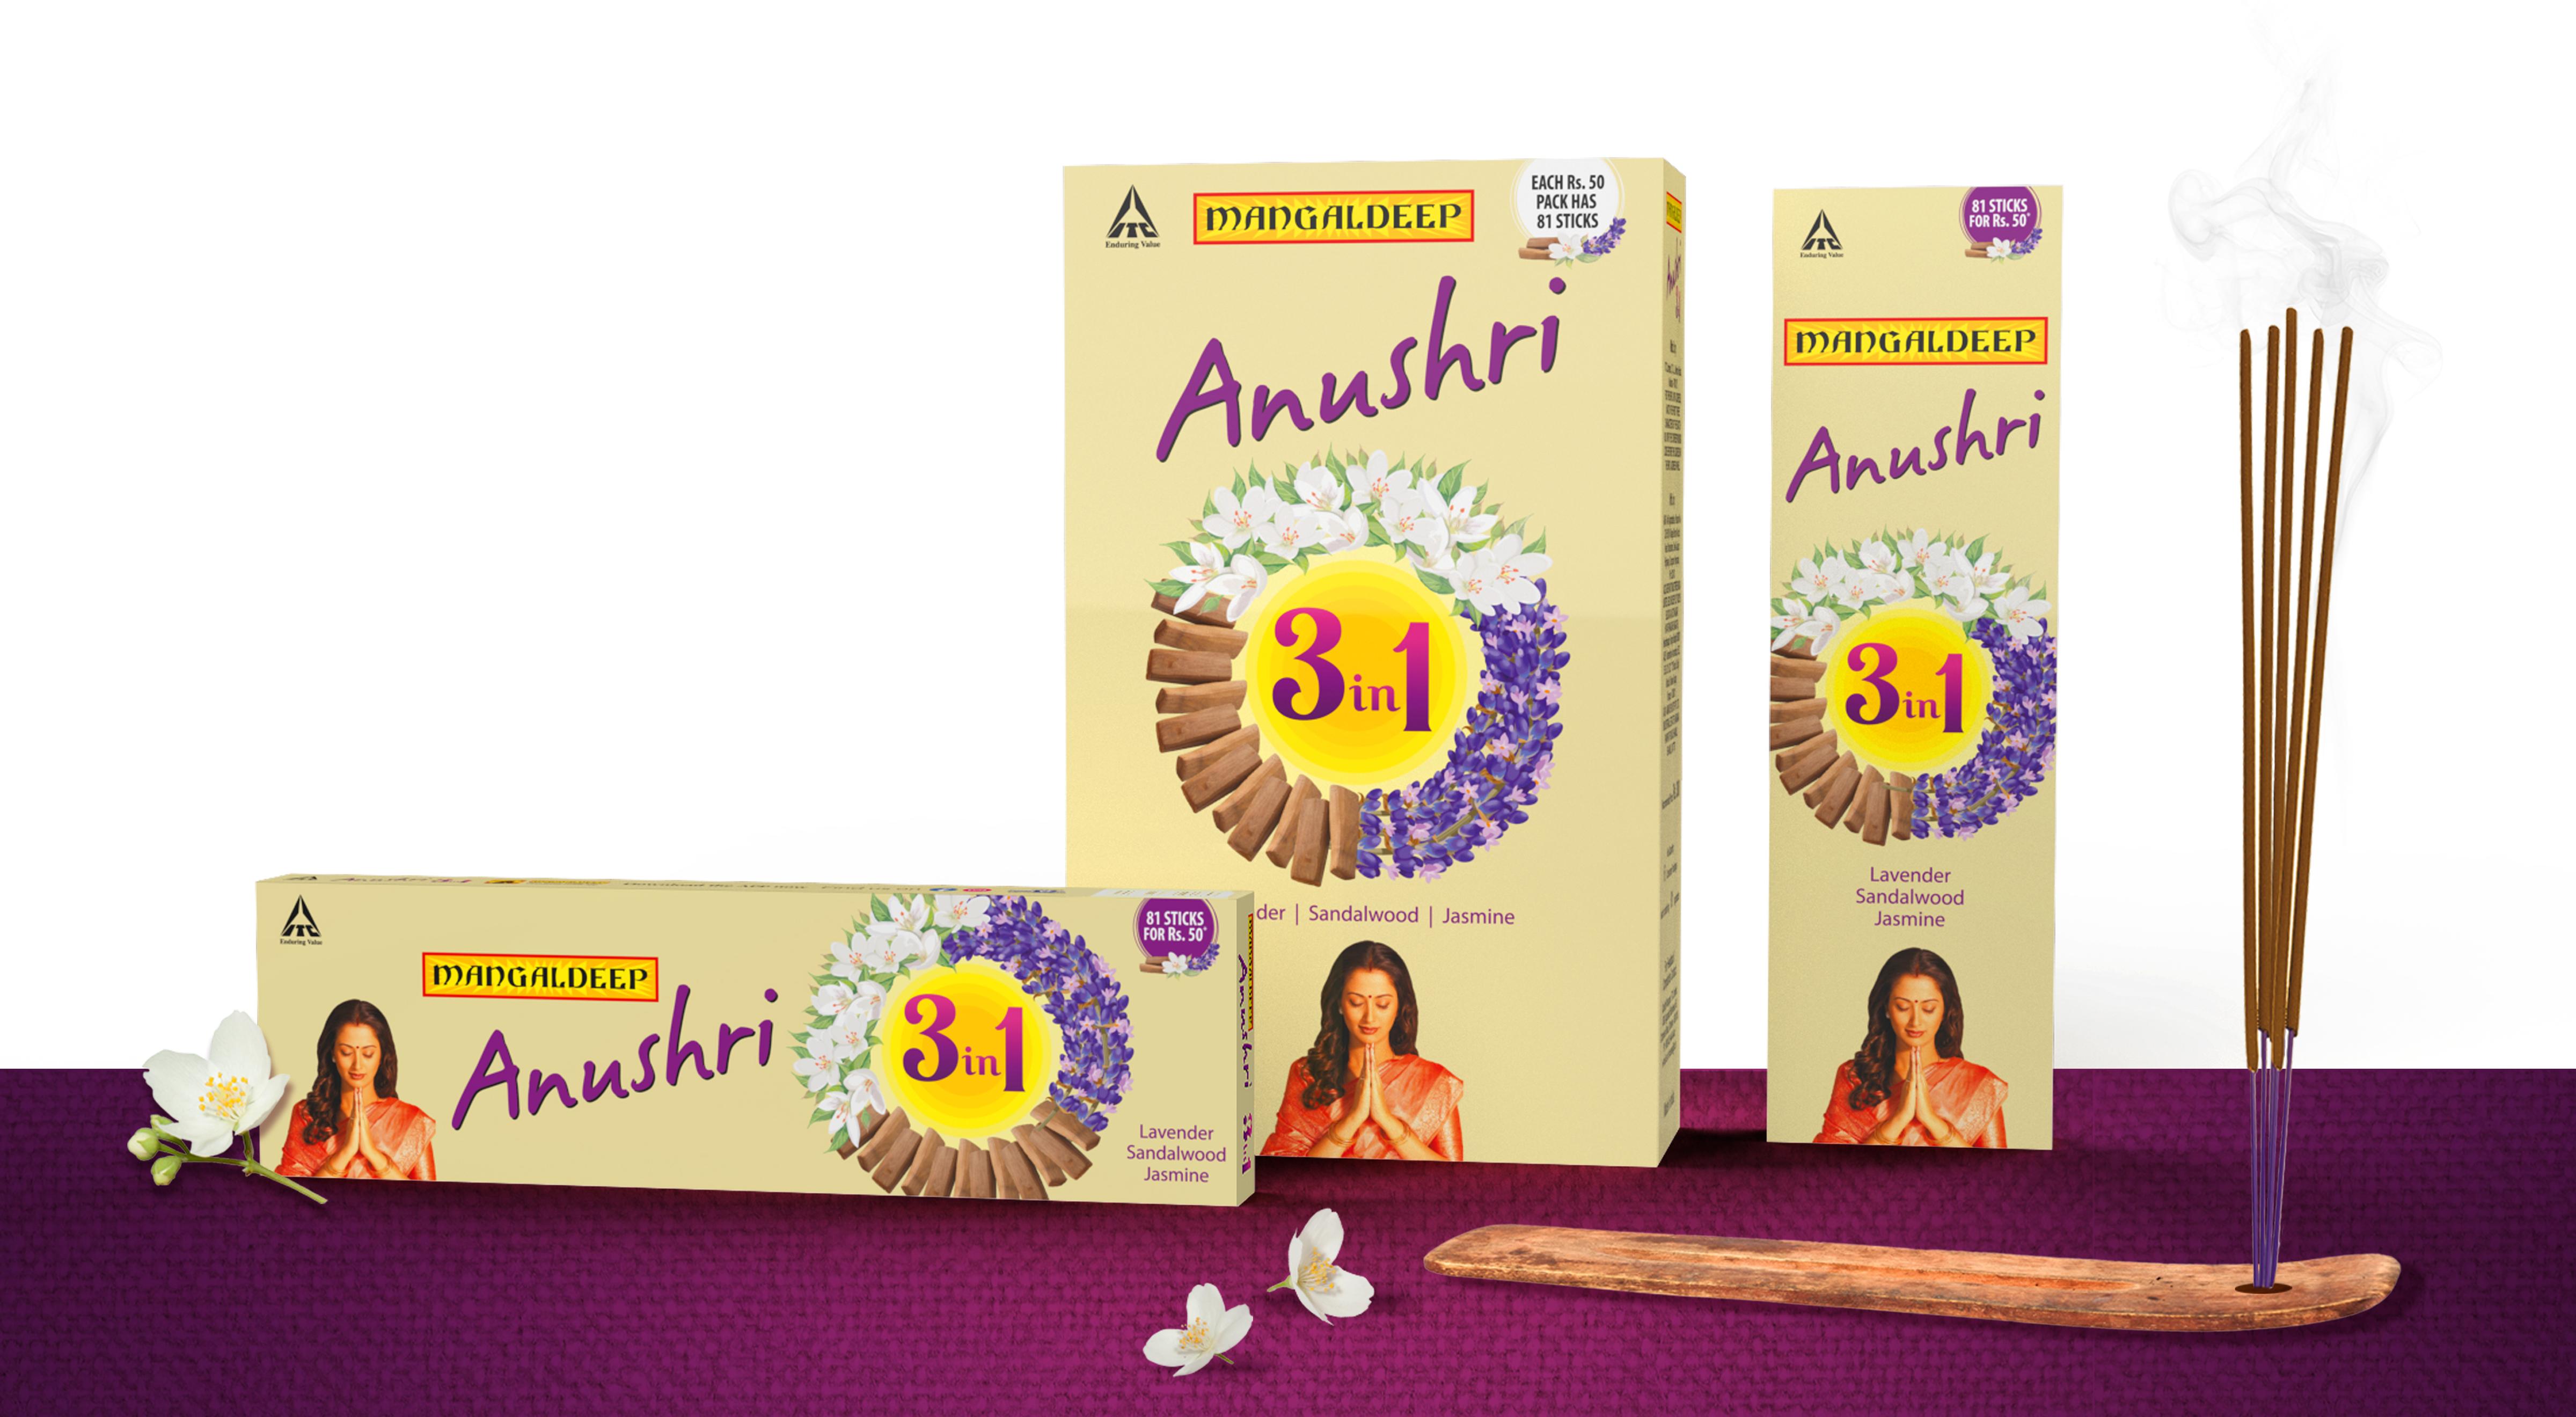 Packaging Design for Incense Sticks - ITC Mangaldeep Anushri